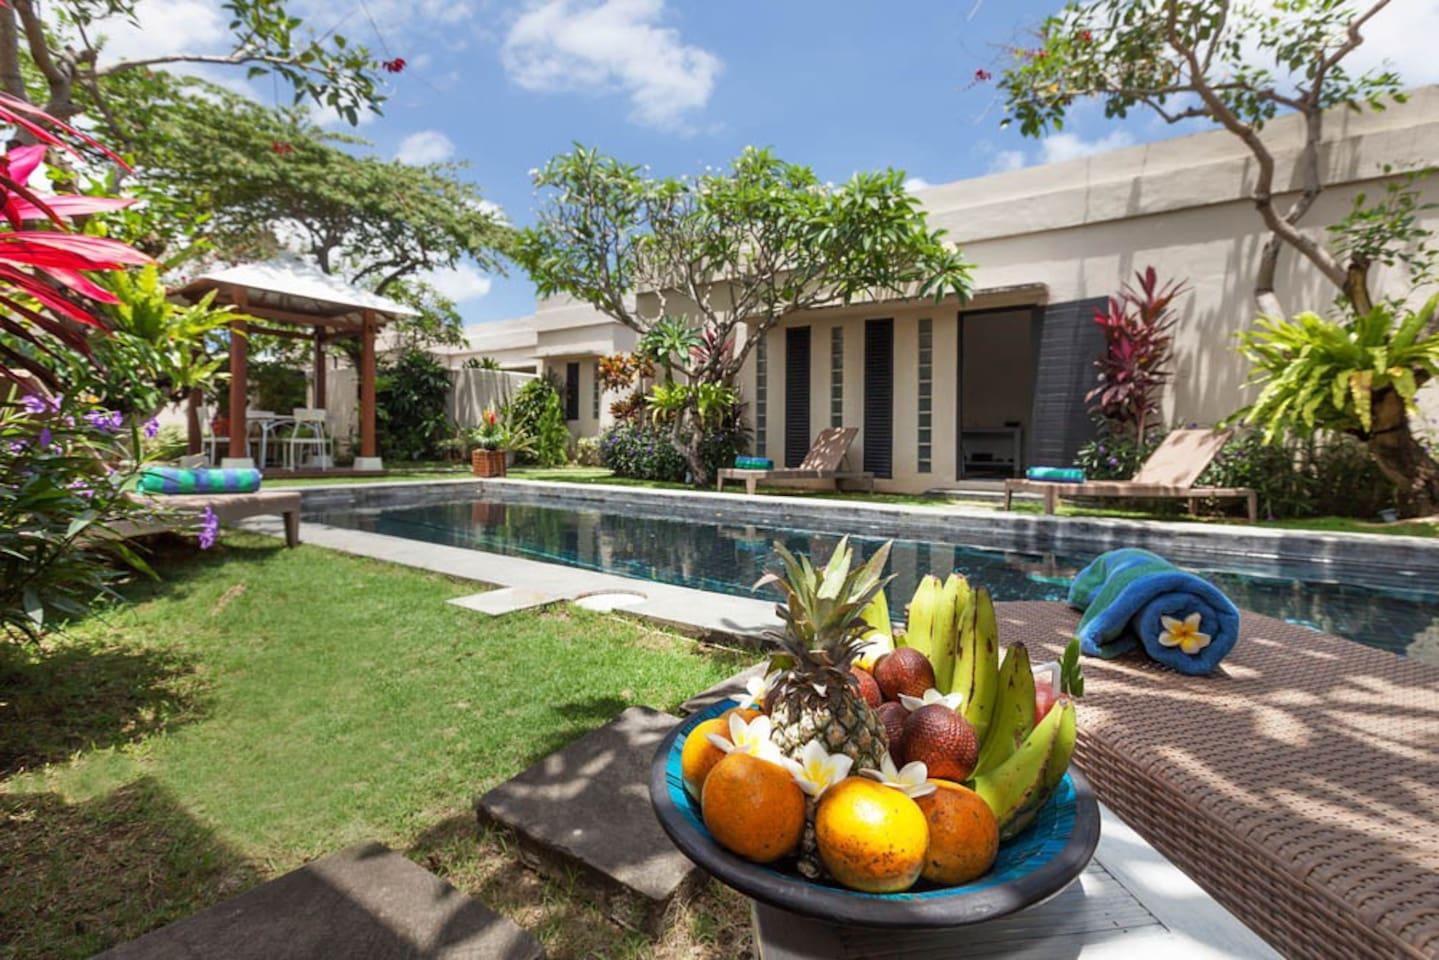 enjoy your pool time with munching fresh fruits, yum yum!!